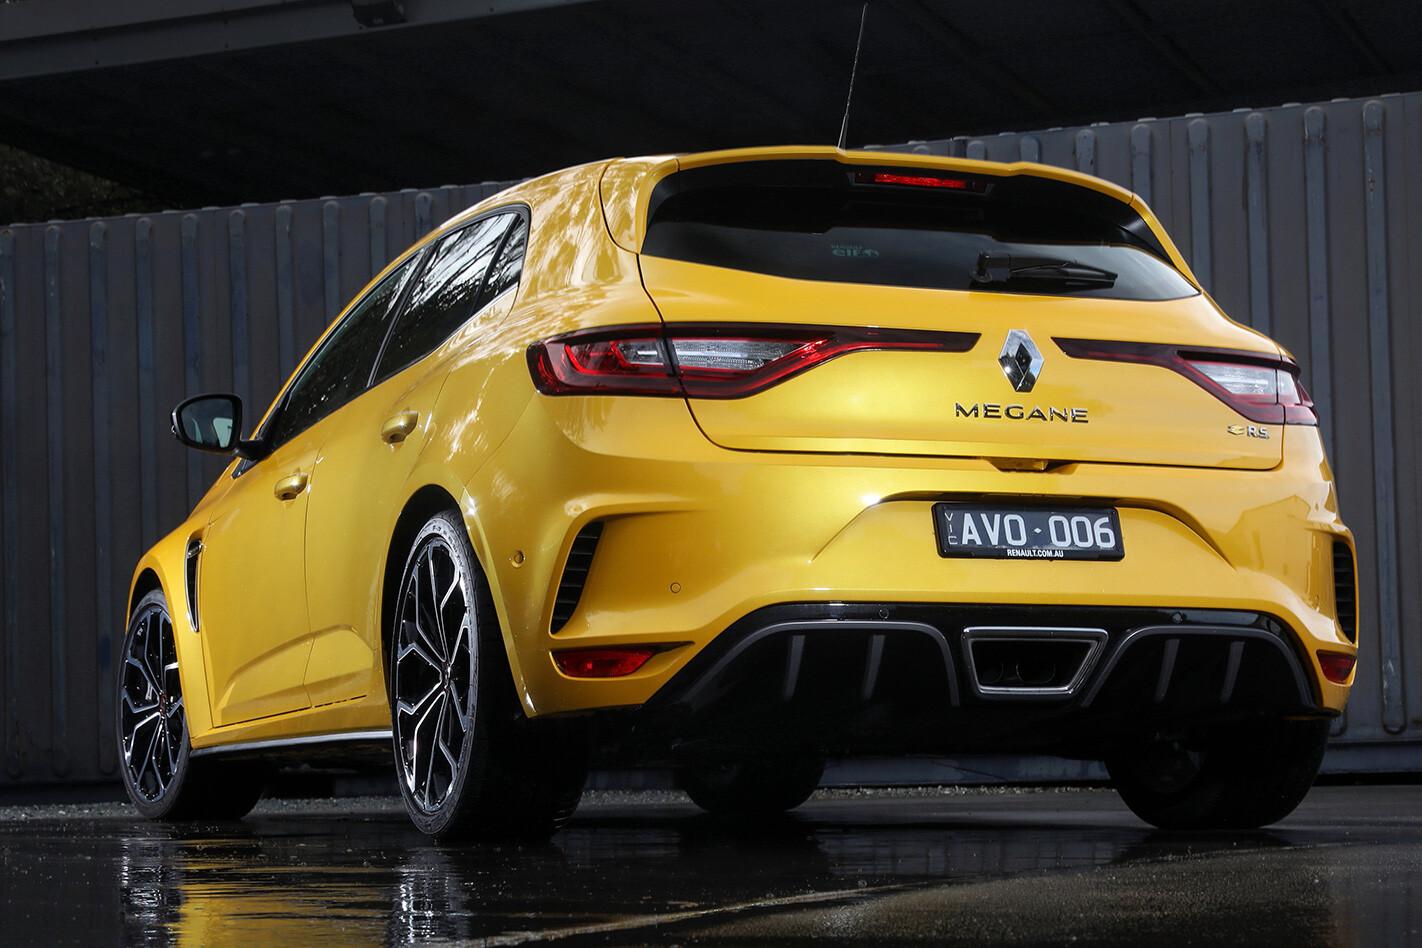 Renault Megane Rs Rear Qtr Jpg